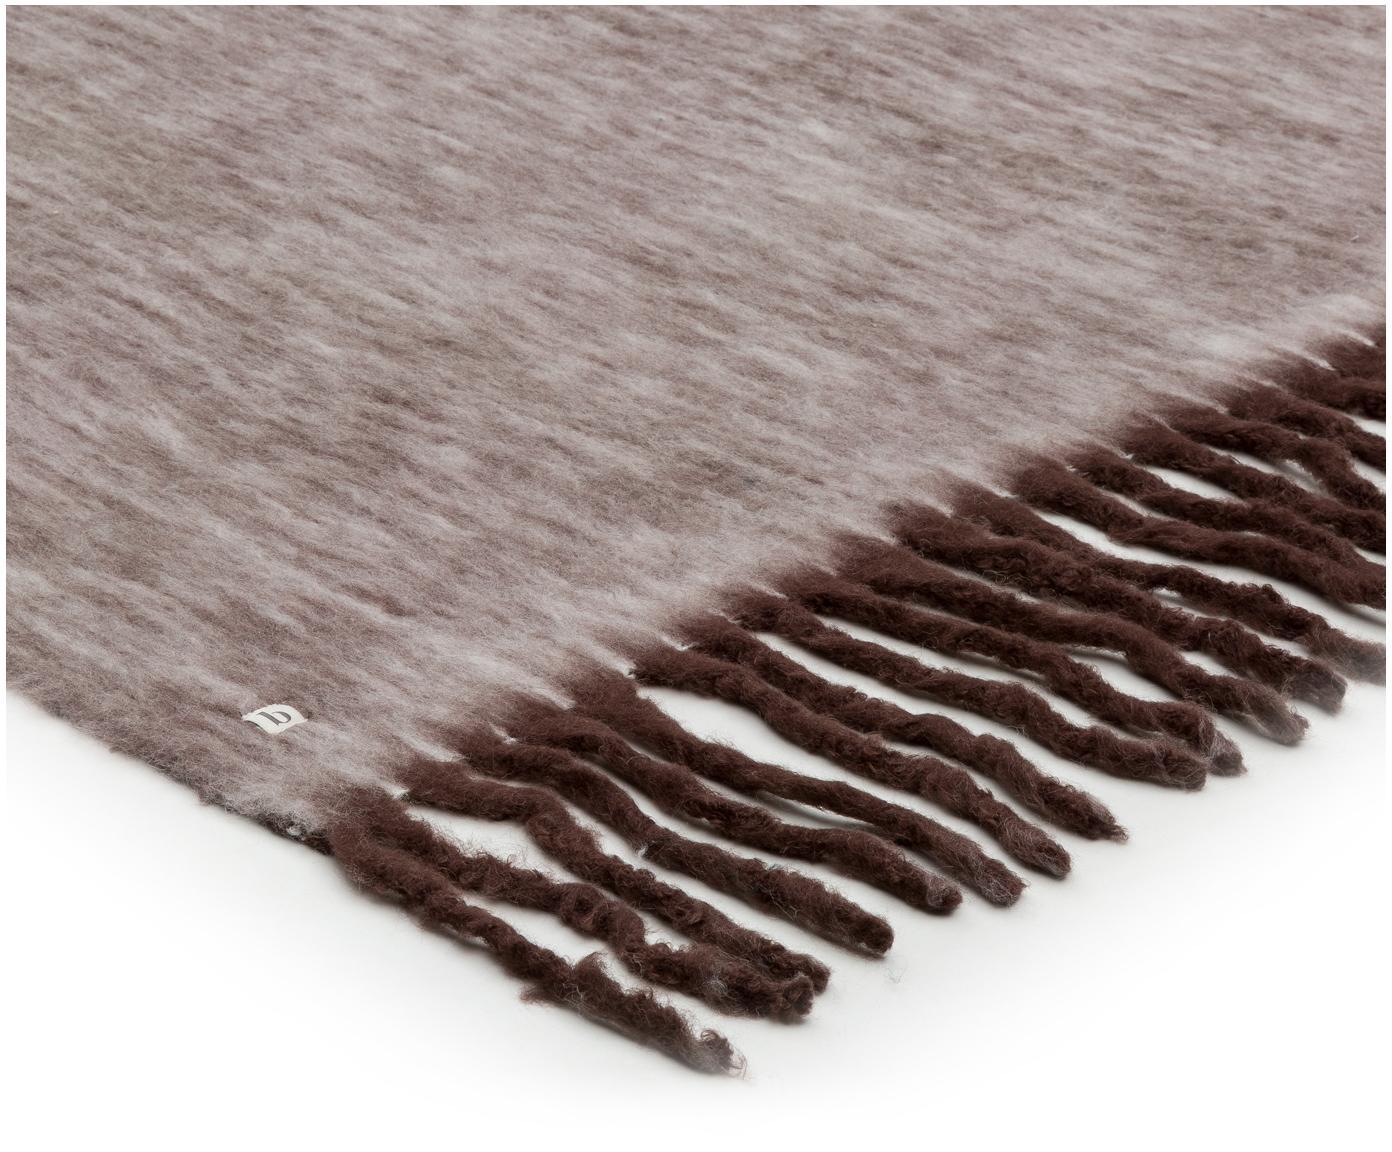 Plaid reversibile Leon, 55% acrilico, 25% lana, 20% nylon, Bianco, rosso rubino, Larg. 130 x Lung. 180 cm